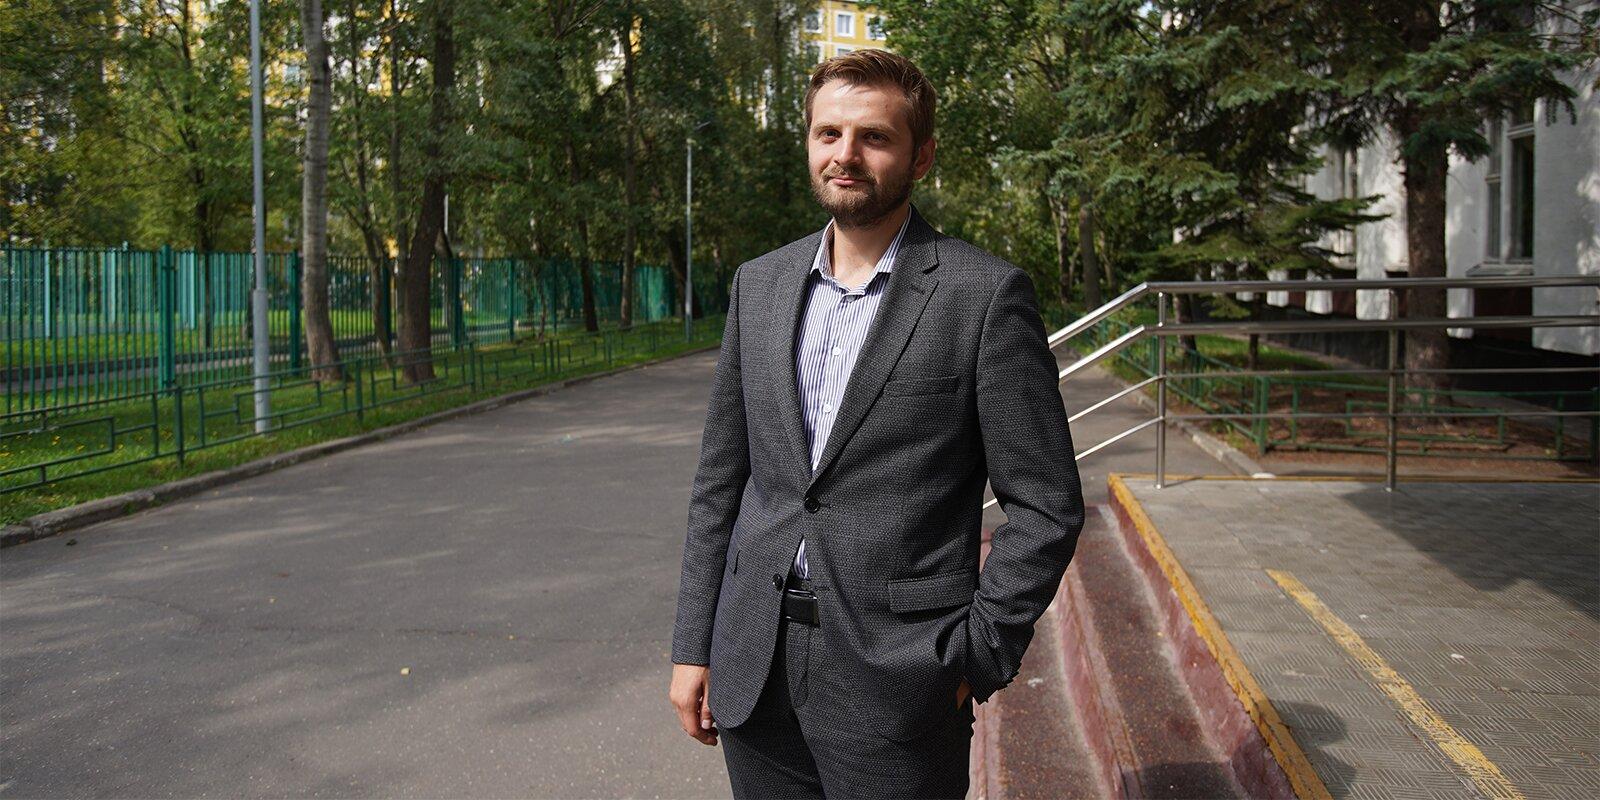 Валерий Дашко, директор школы № 780. Фото Е. Самарина. Mos.ru